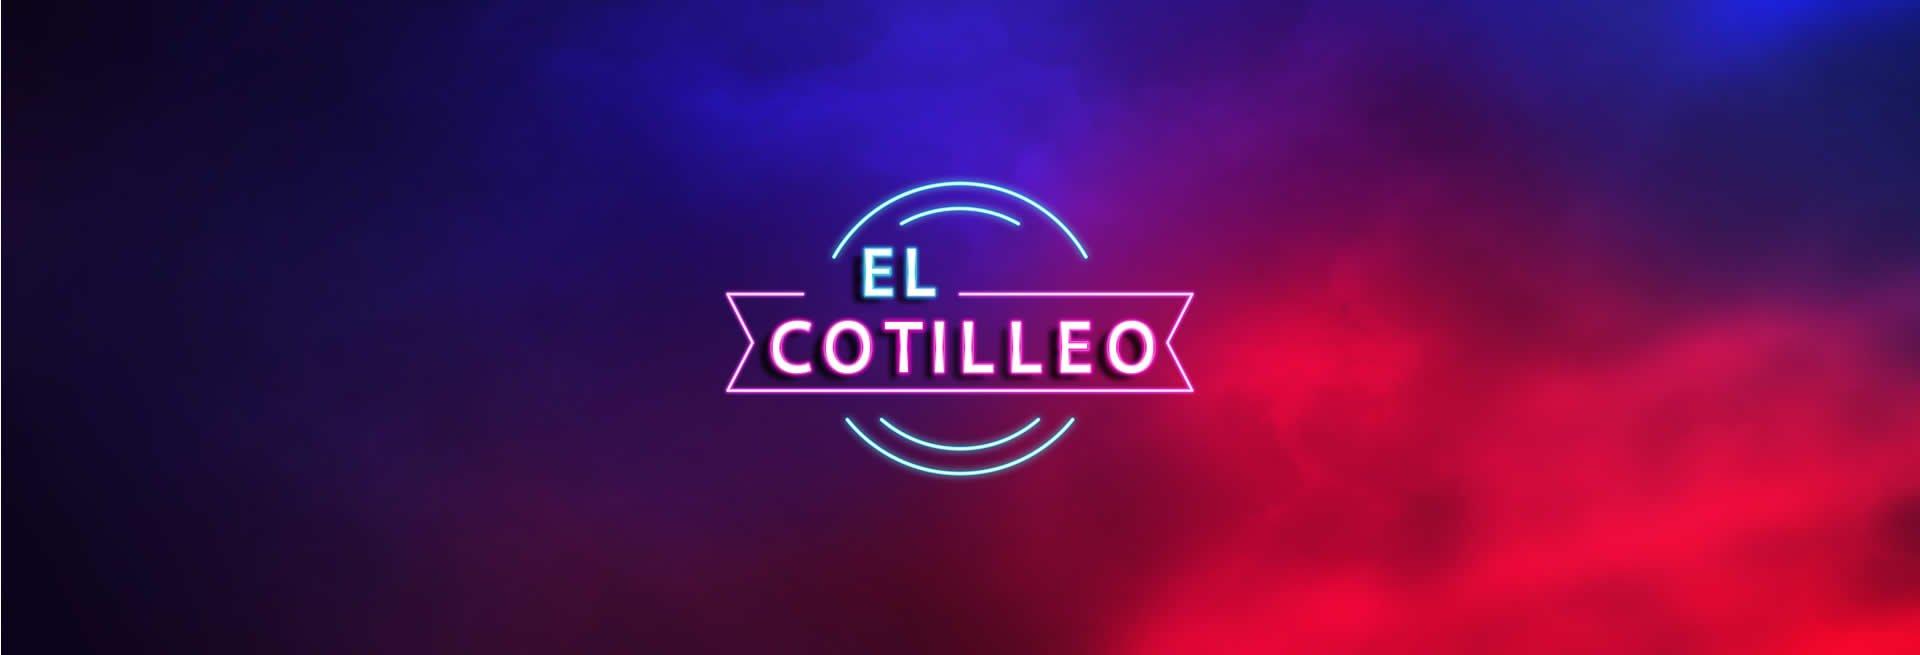 El Cotilleo